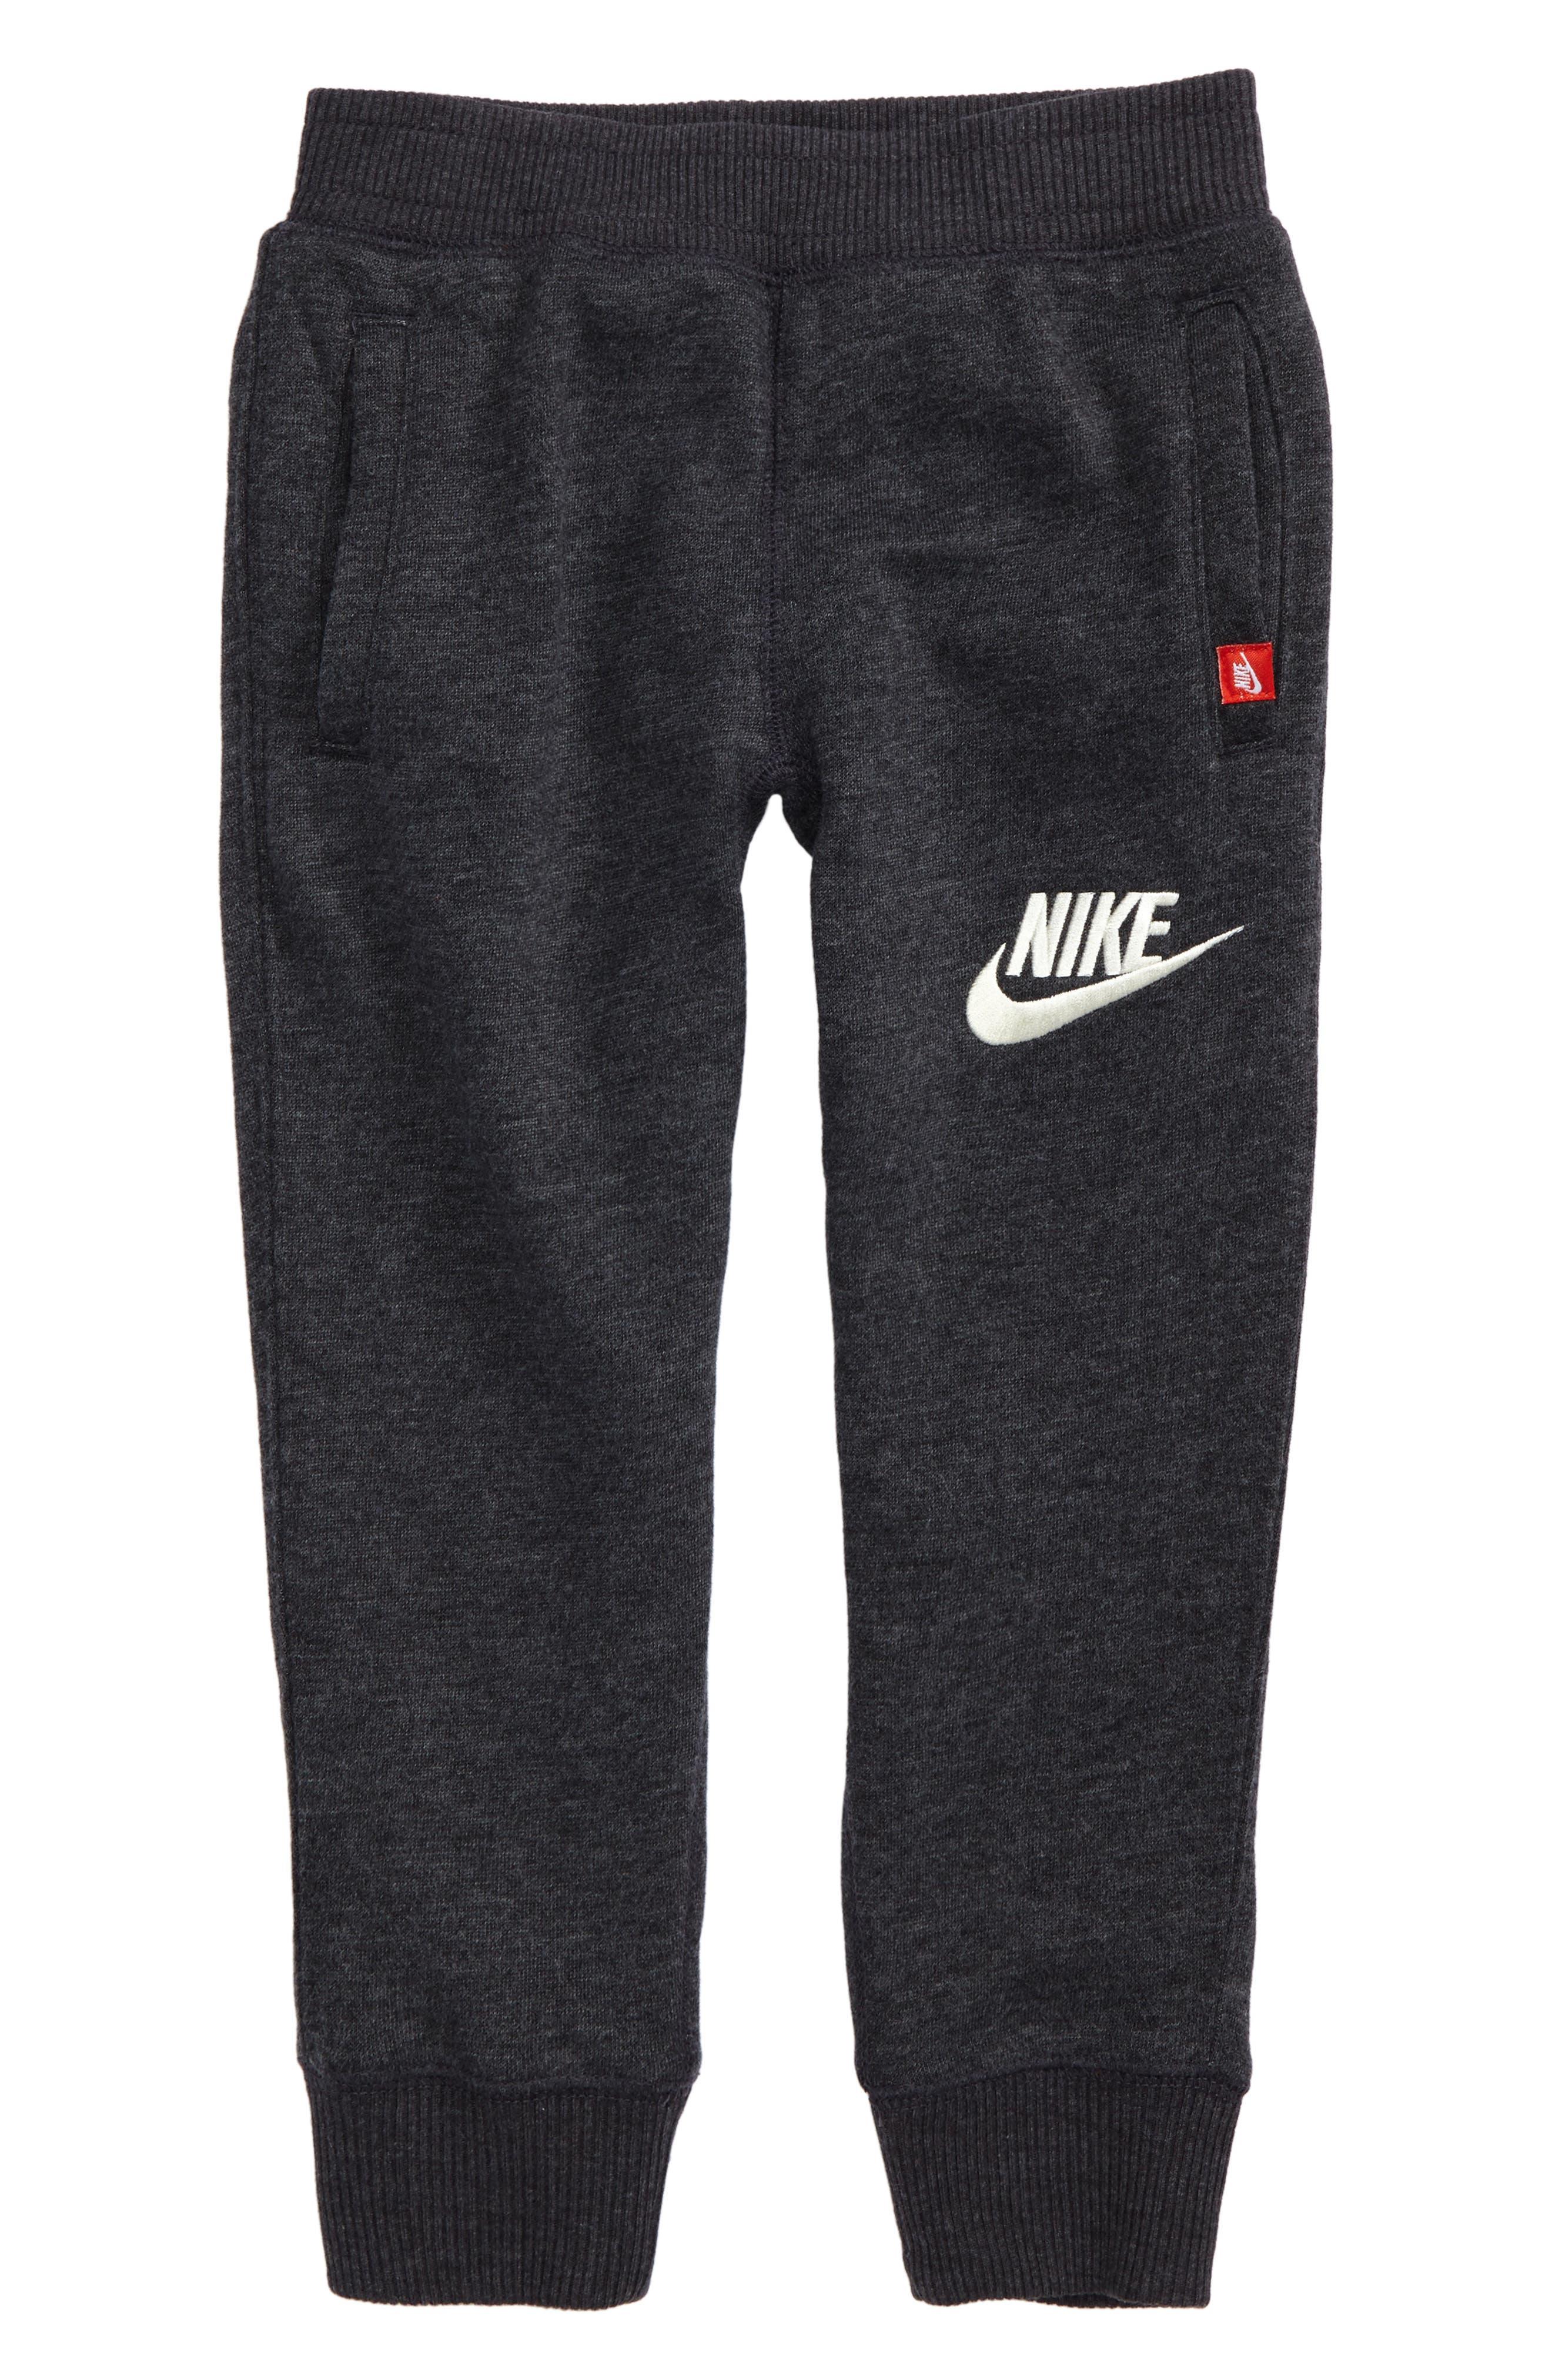 Alternate Image 1 Selected - Nike Legacy Jogger Pants (Toddler Boys & Little Boys)